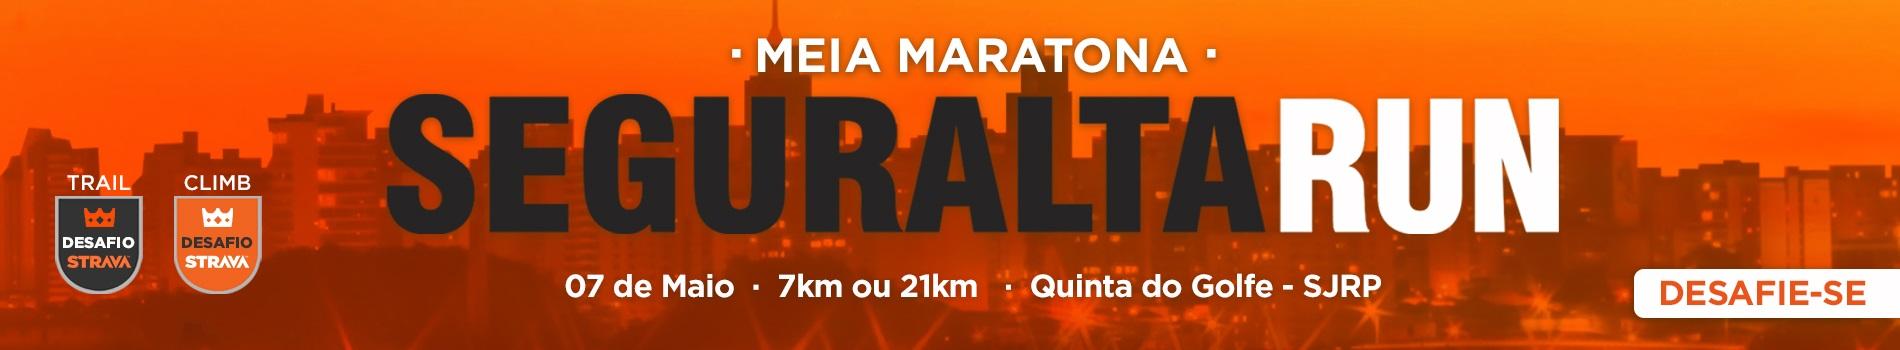 MEIA MARATONA SEGURALTA 2017 - 21K E 7K - Imagem de topo